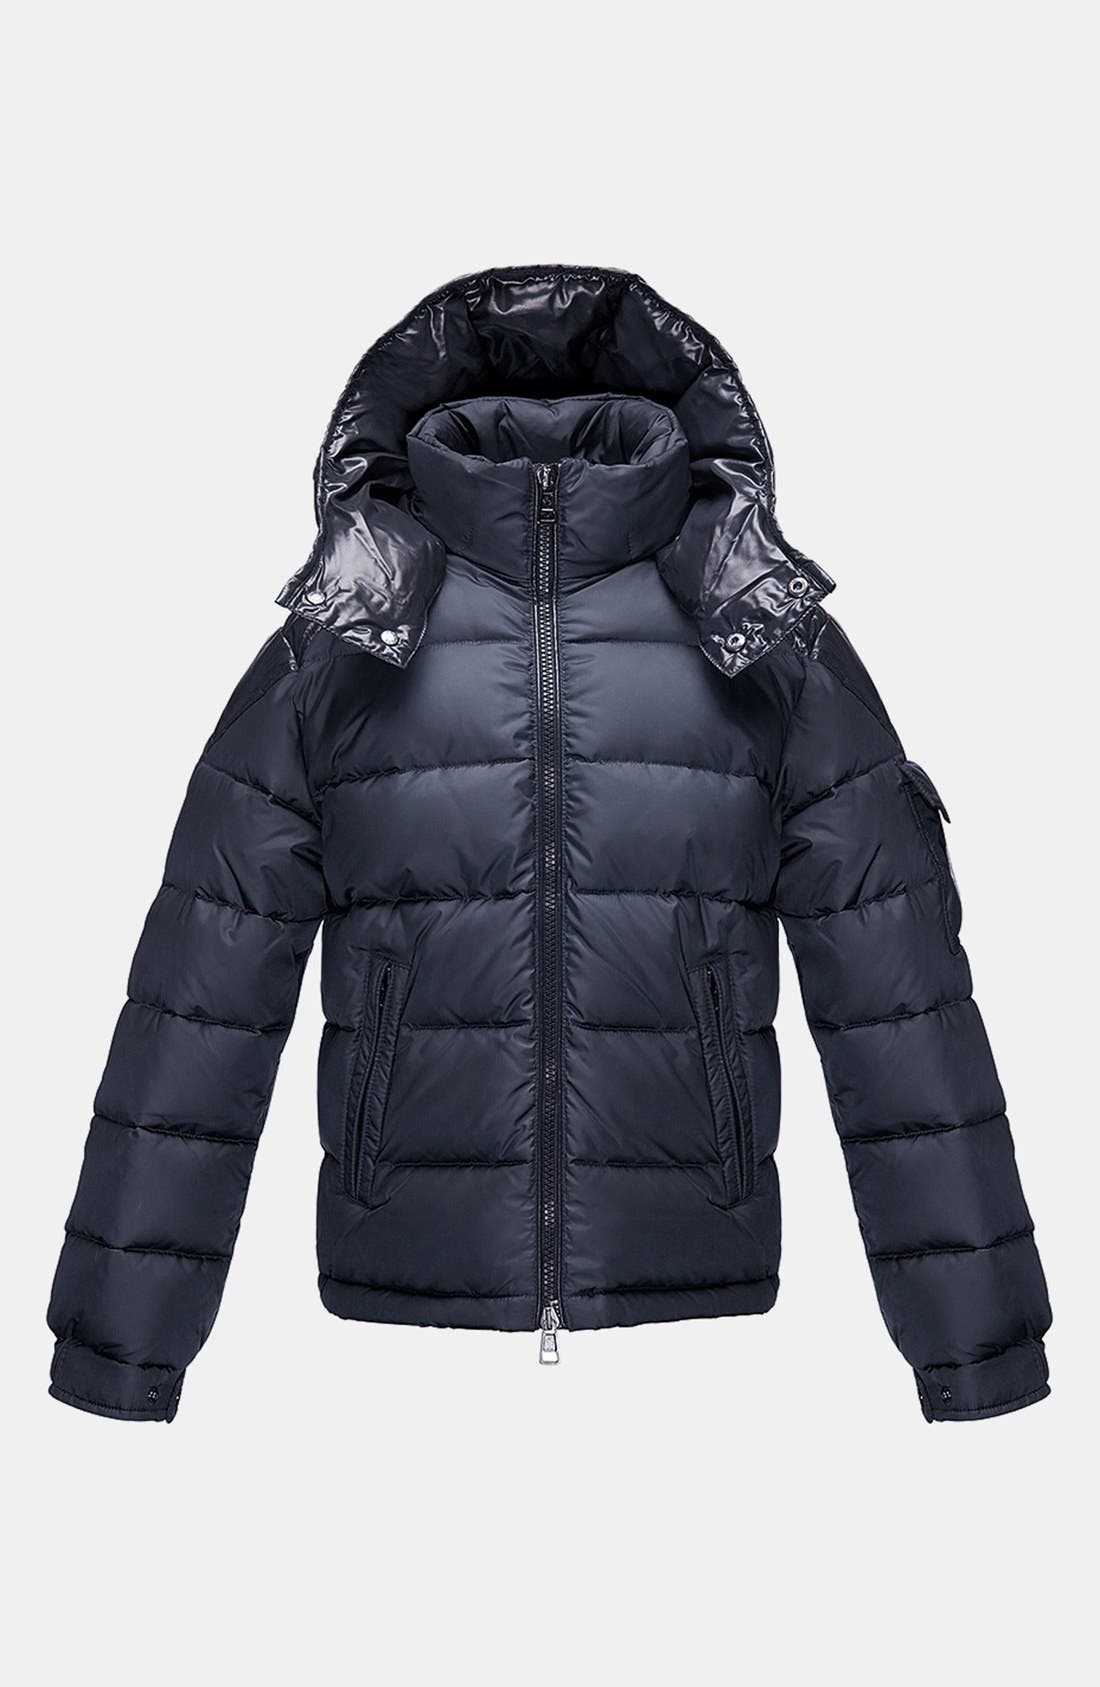 Alternate Image 1 Selected - Moncler 'Chevalier' Hooded Down Jacket (Toddler Boys, Little Boys & Big Boys)